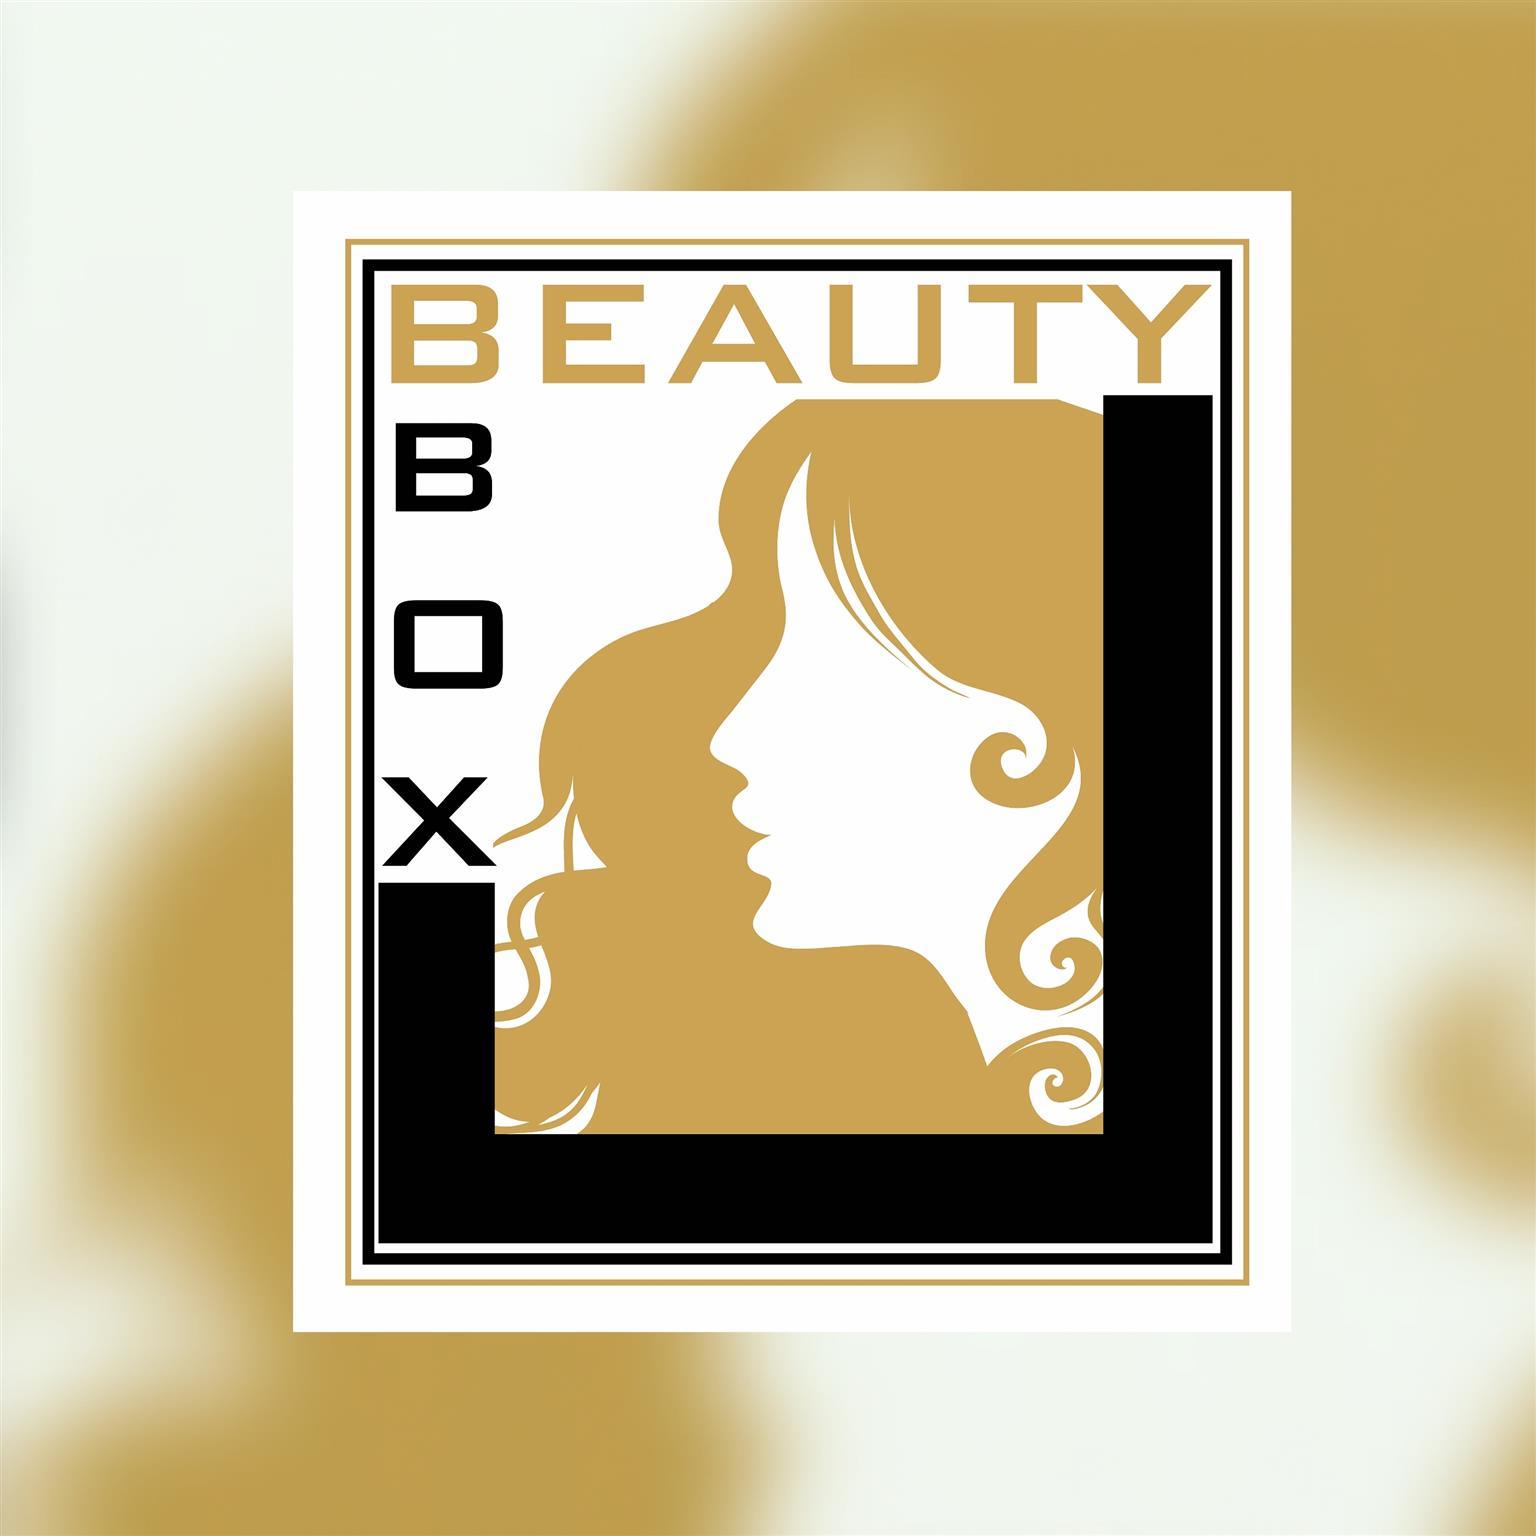 Beautybox training academy